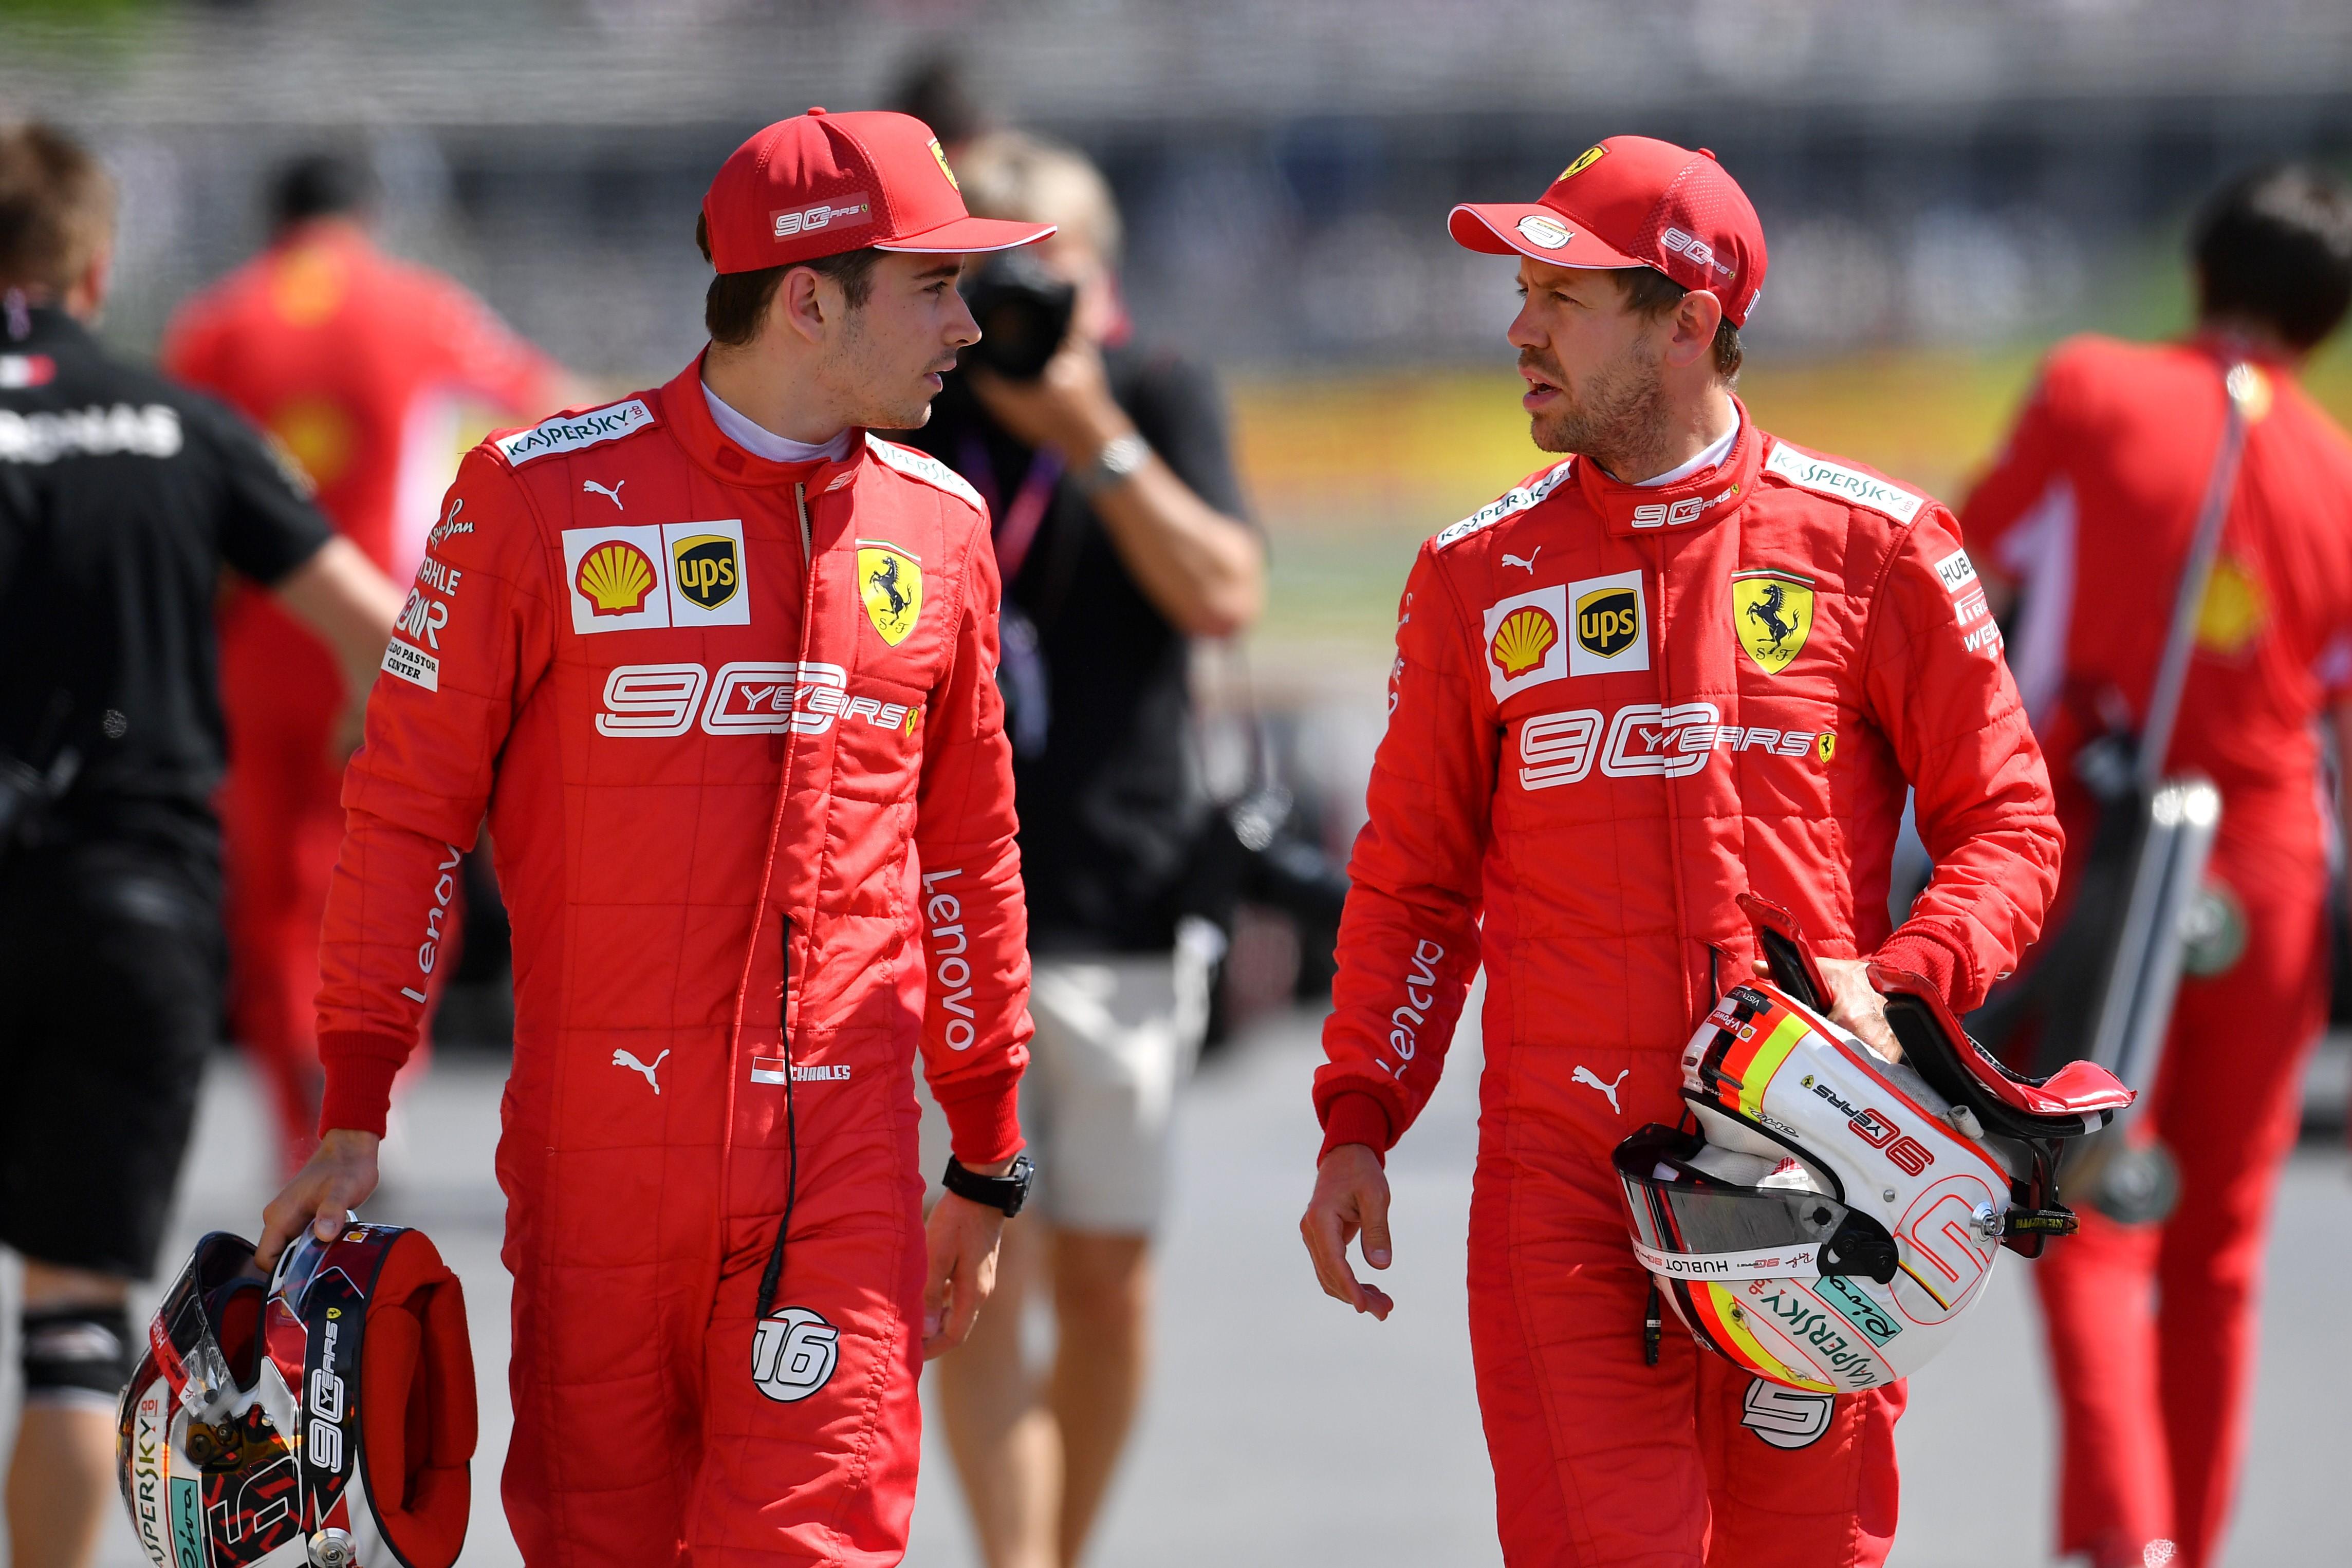 GP de F1 de Grande-Bretagne: où est passé Sebastian Vettel ?